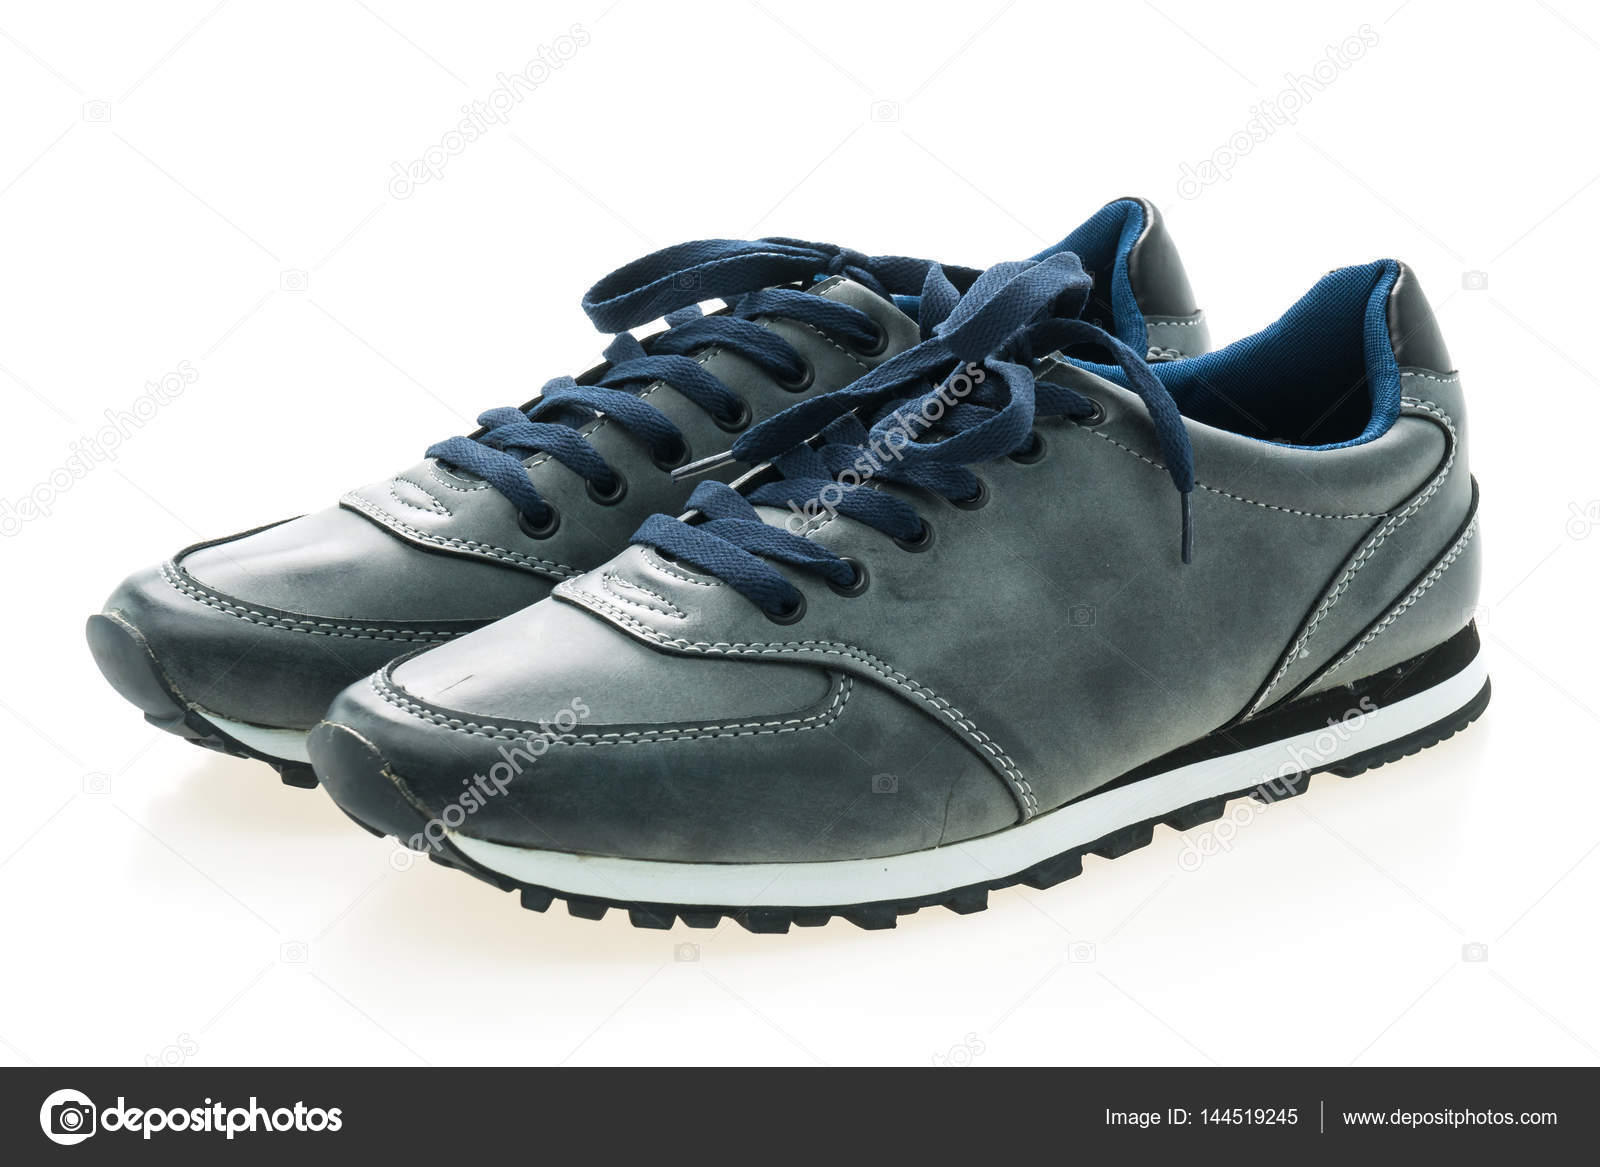 409b5e005a4 μόδα παπούτσια άνδρες — Φωτογραφία Αρχείου © mrsiraphol #144519245